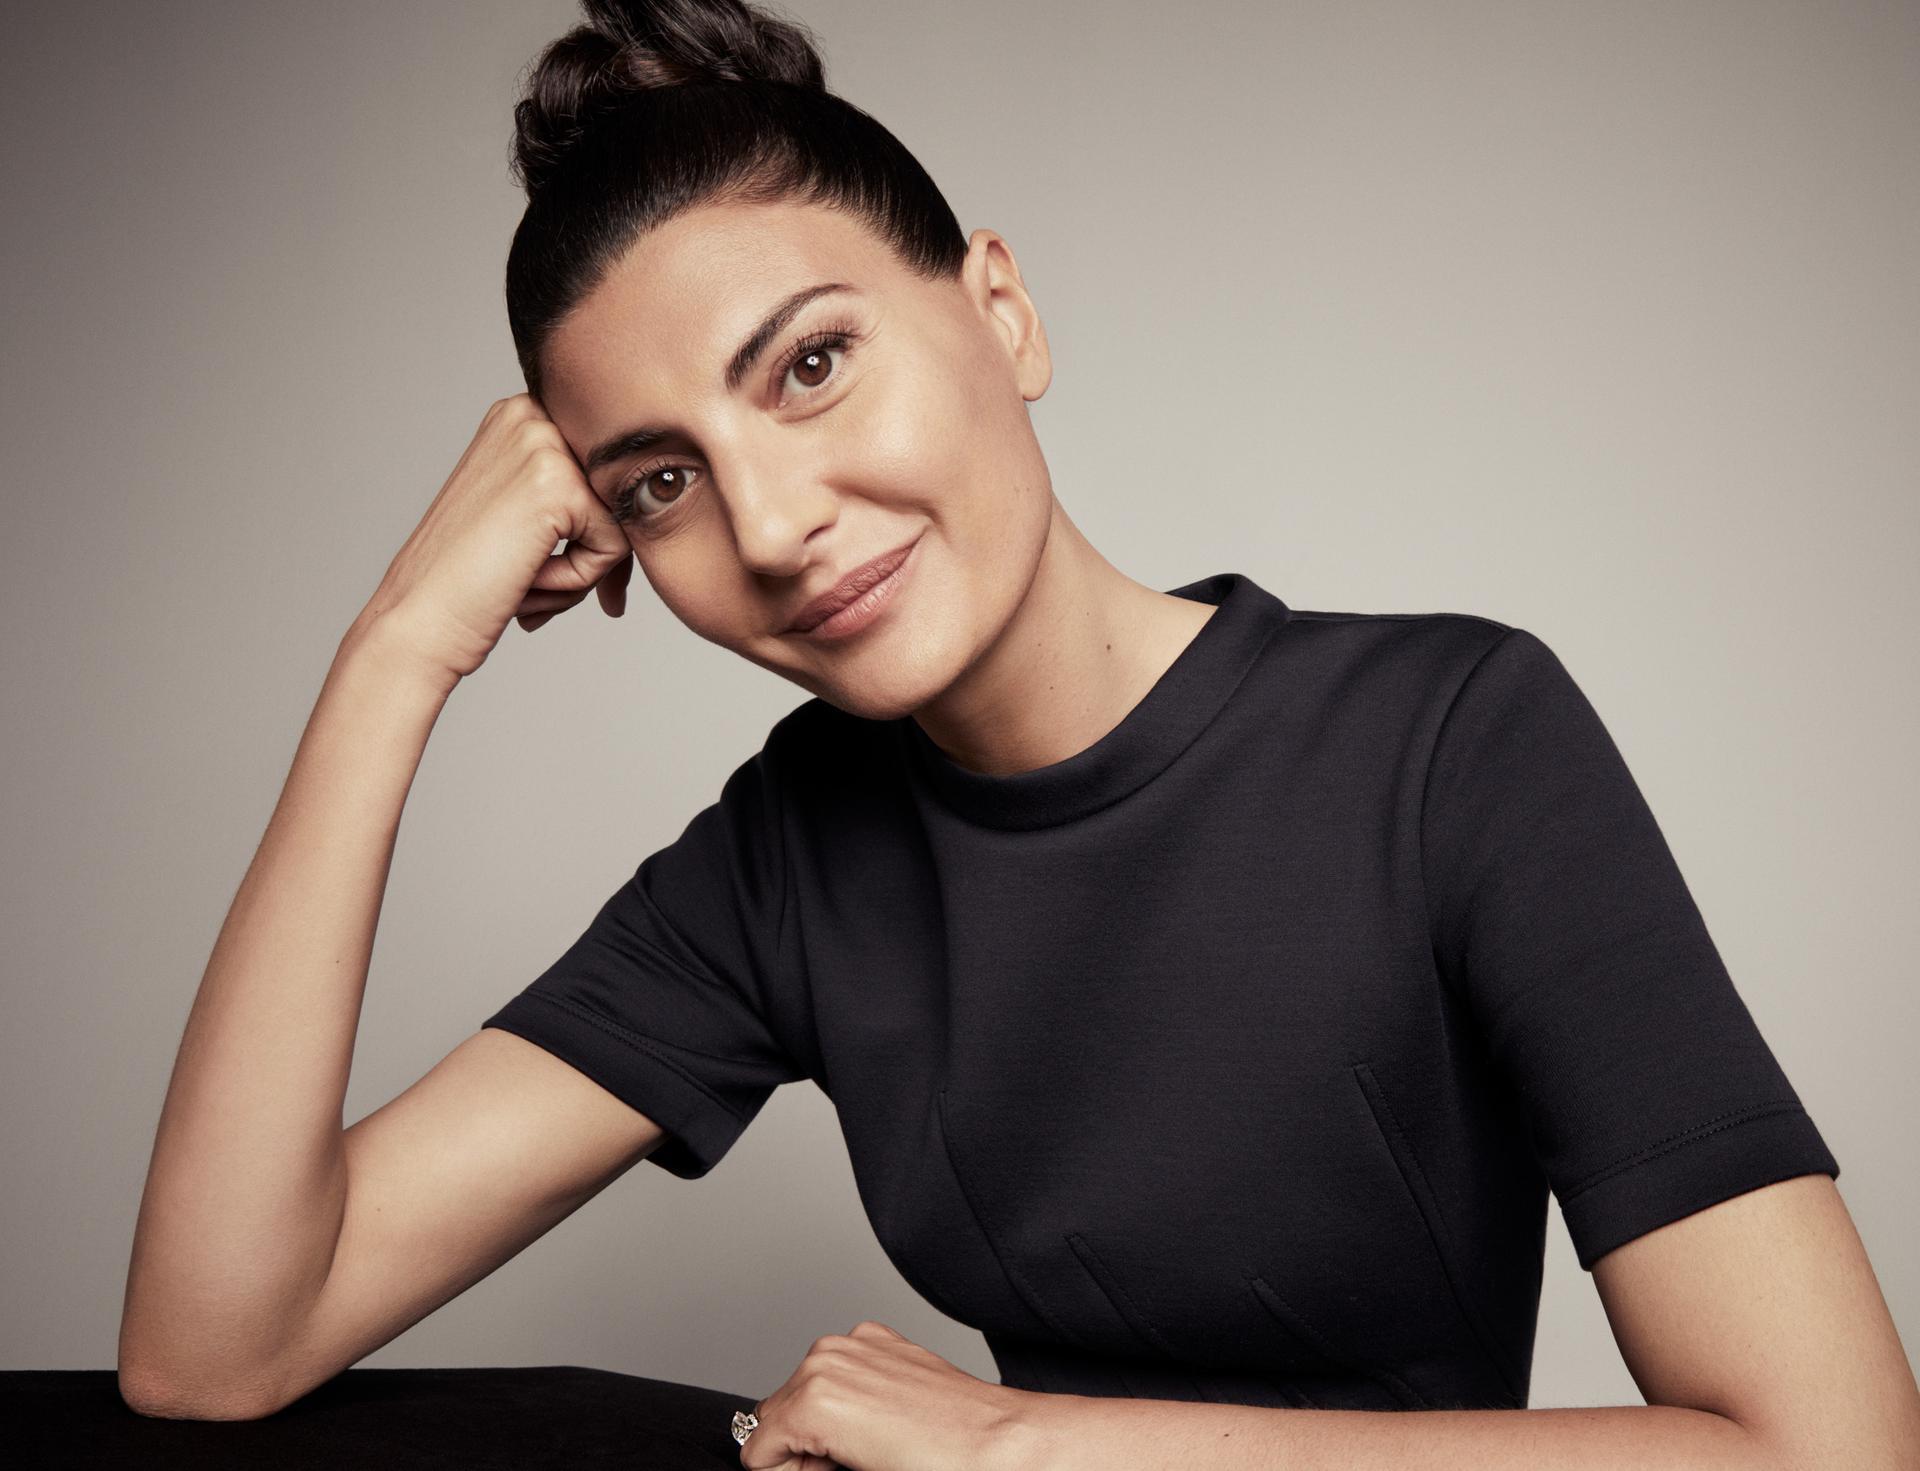 Swarovski Names Giovanna Battaglia Engelbert as Creative Director